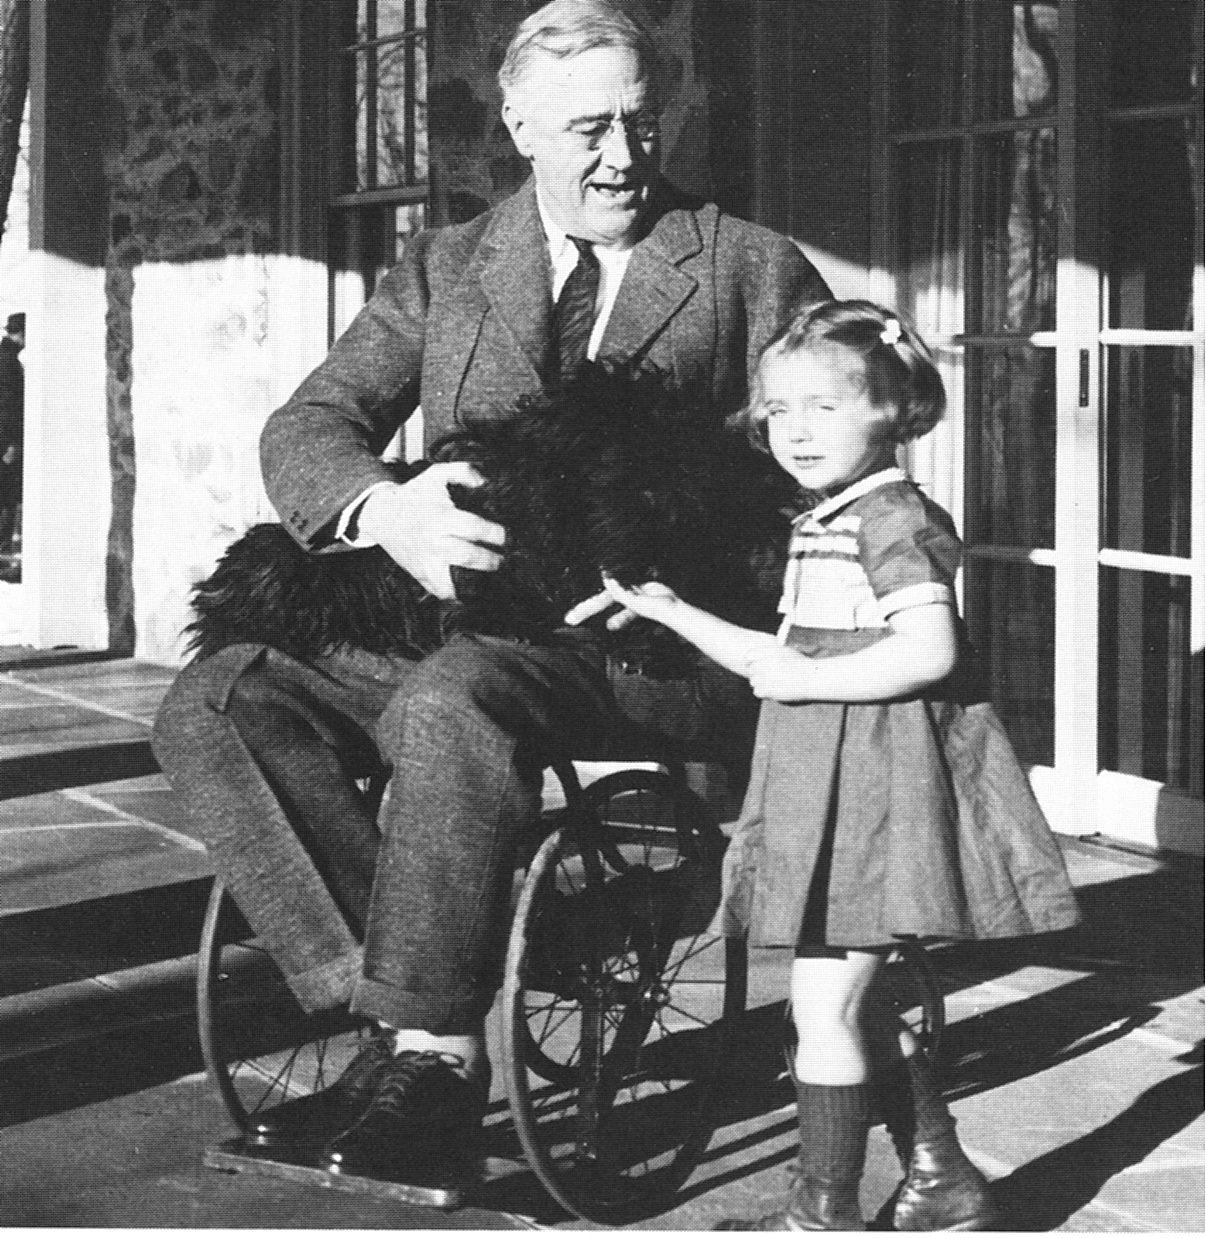 Roosevelt na vozičku.